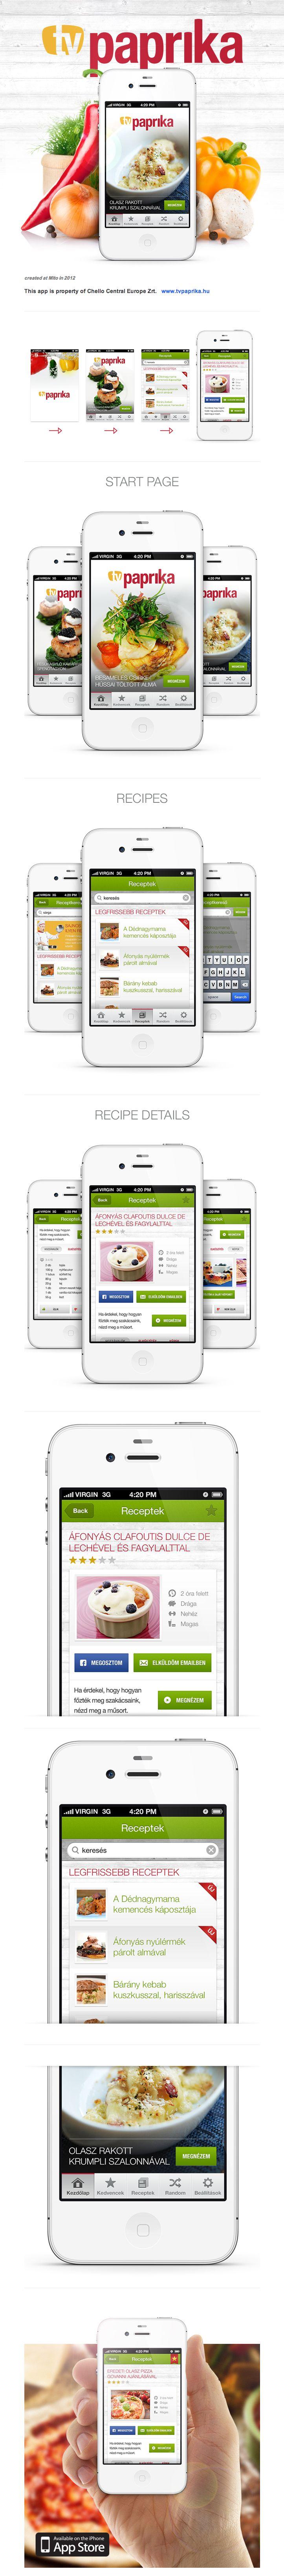 TV Paprika iPhone application by Gabor Jutasi, via Behance